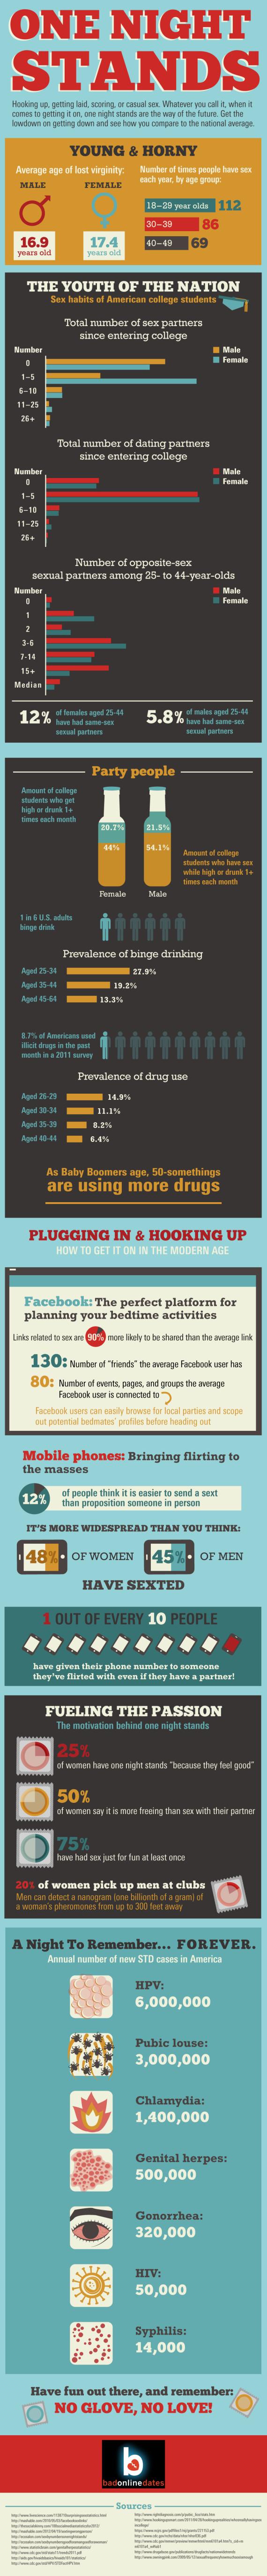 onenightstand infographic